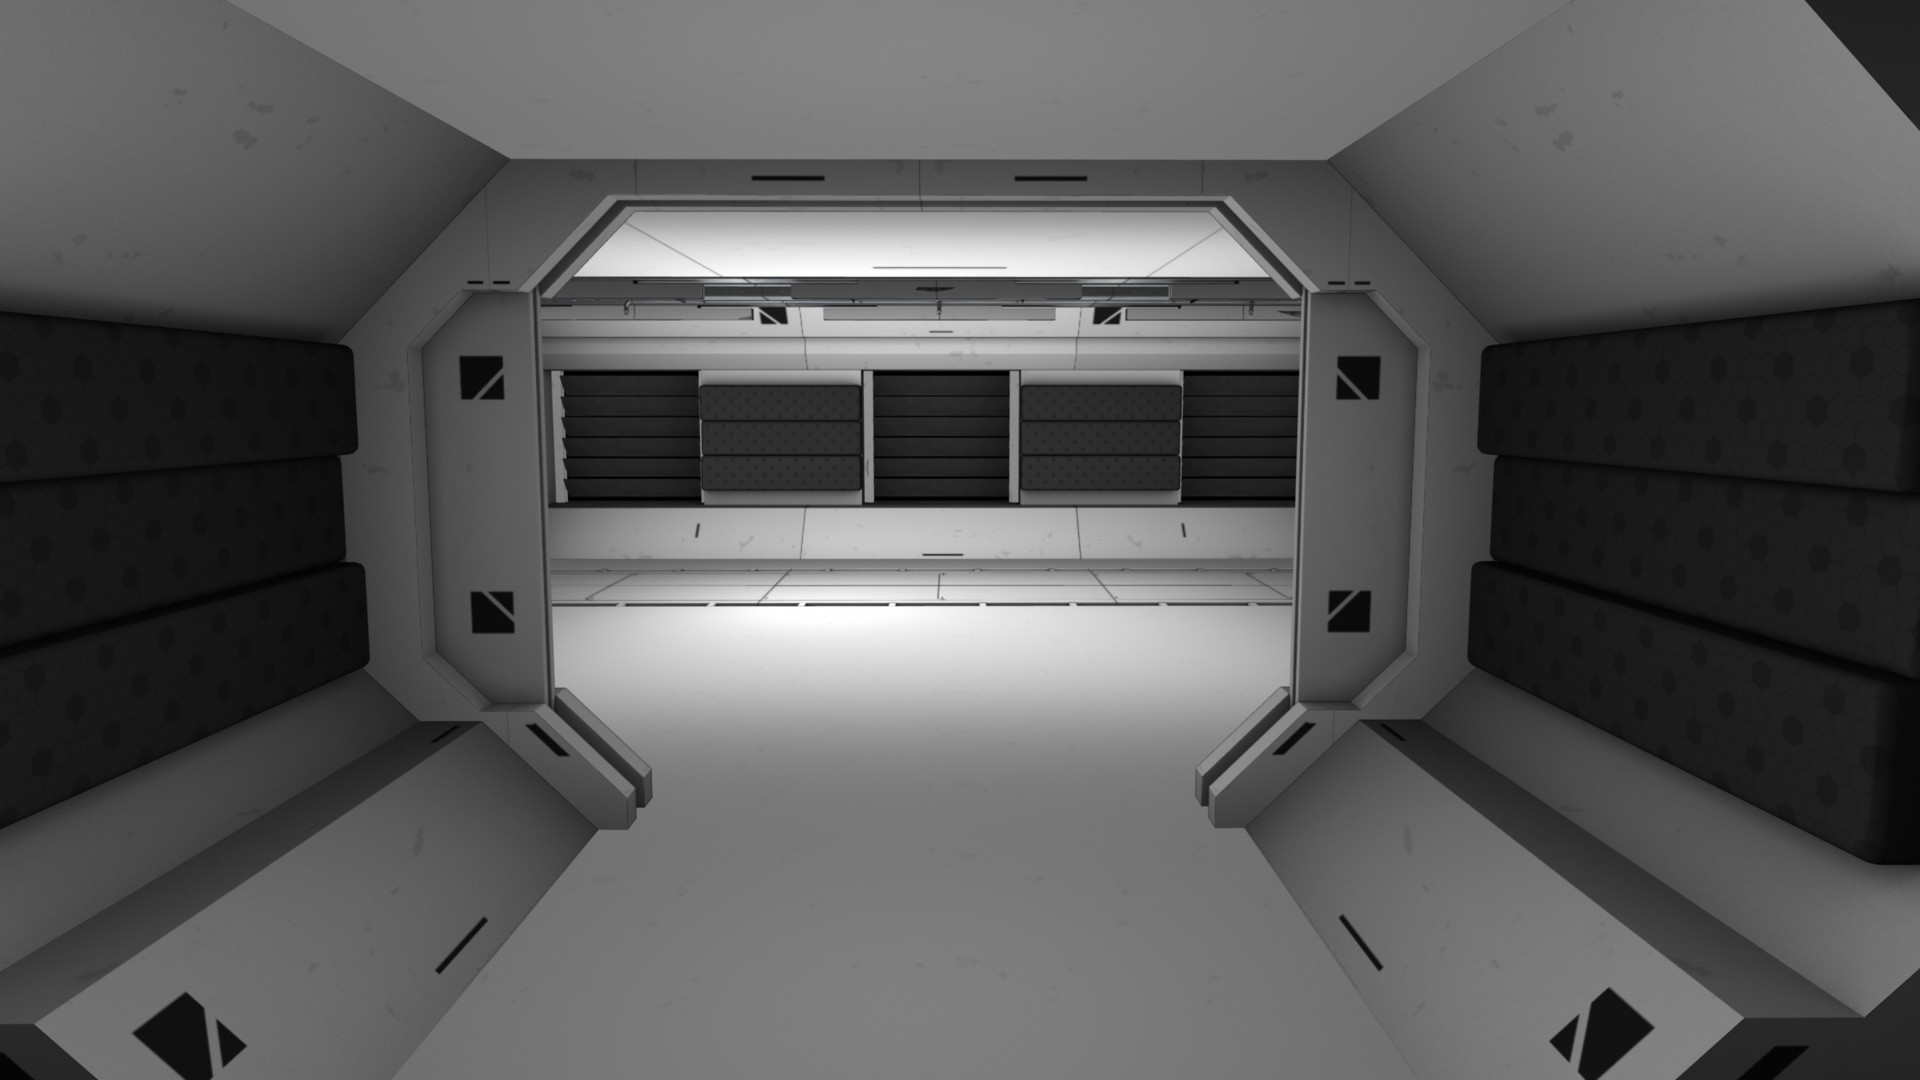 sci fi ceiling texture. Exellent Ceiling Bryan Entac Scifi Interior Texture Done On Sci Fi Ceiling Texture